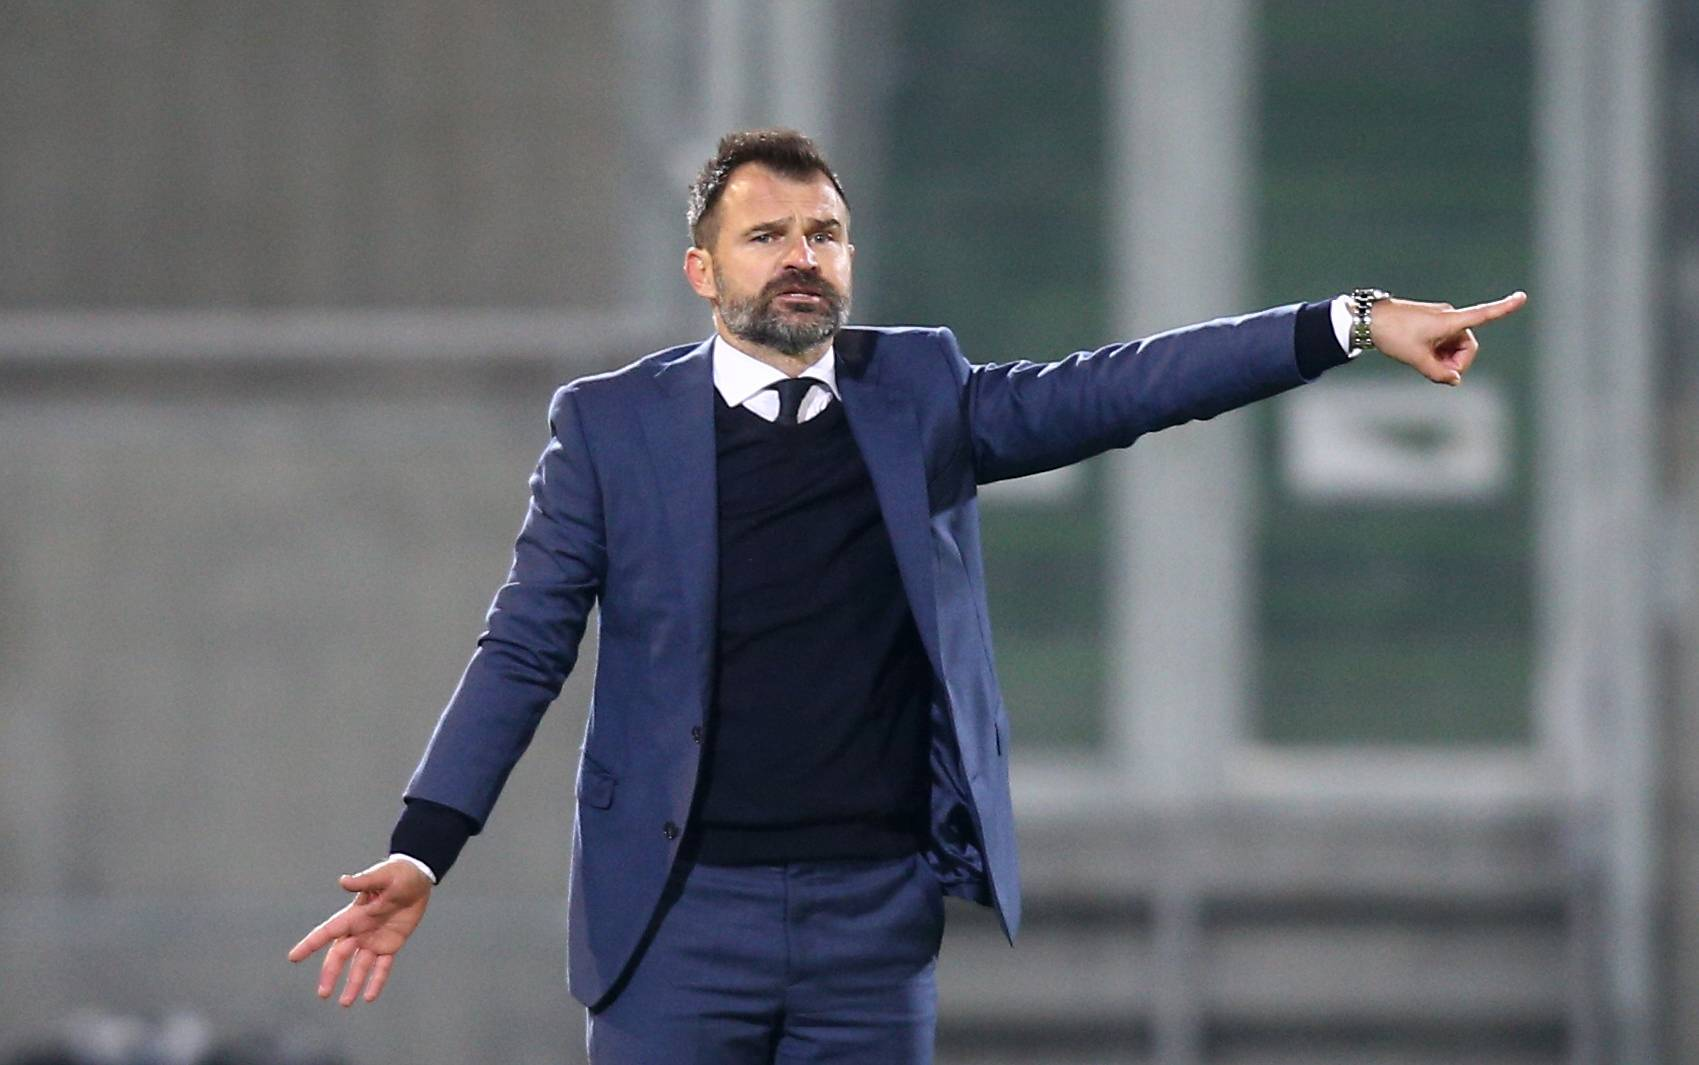 Europa League - Group J - PFC Ludogorets Razgrad v Royal Antwerp